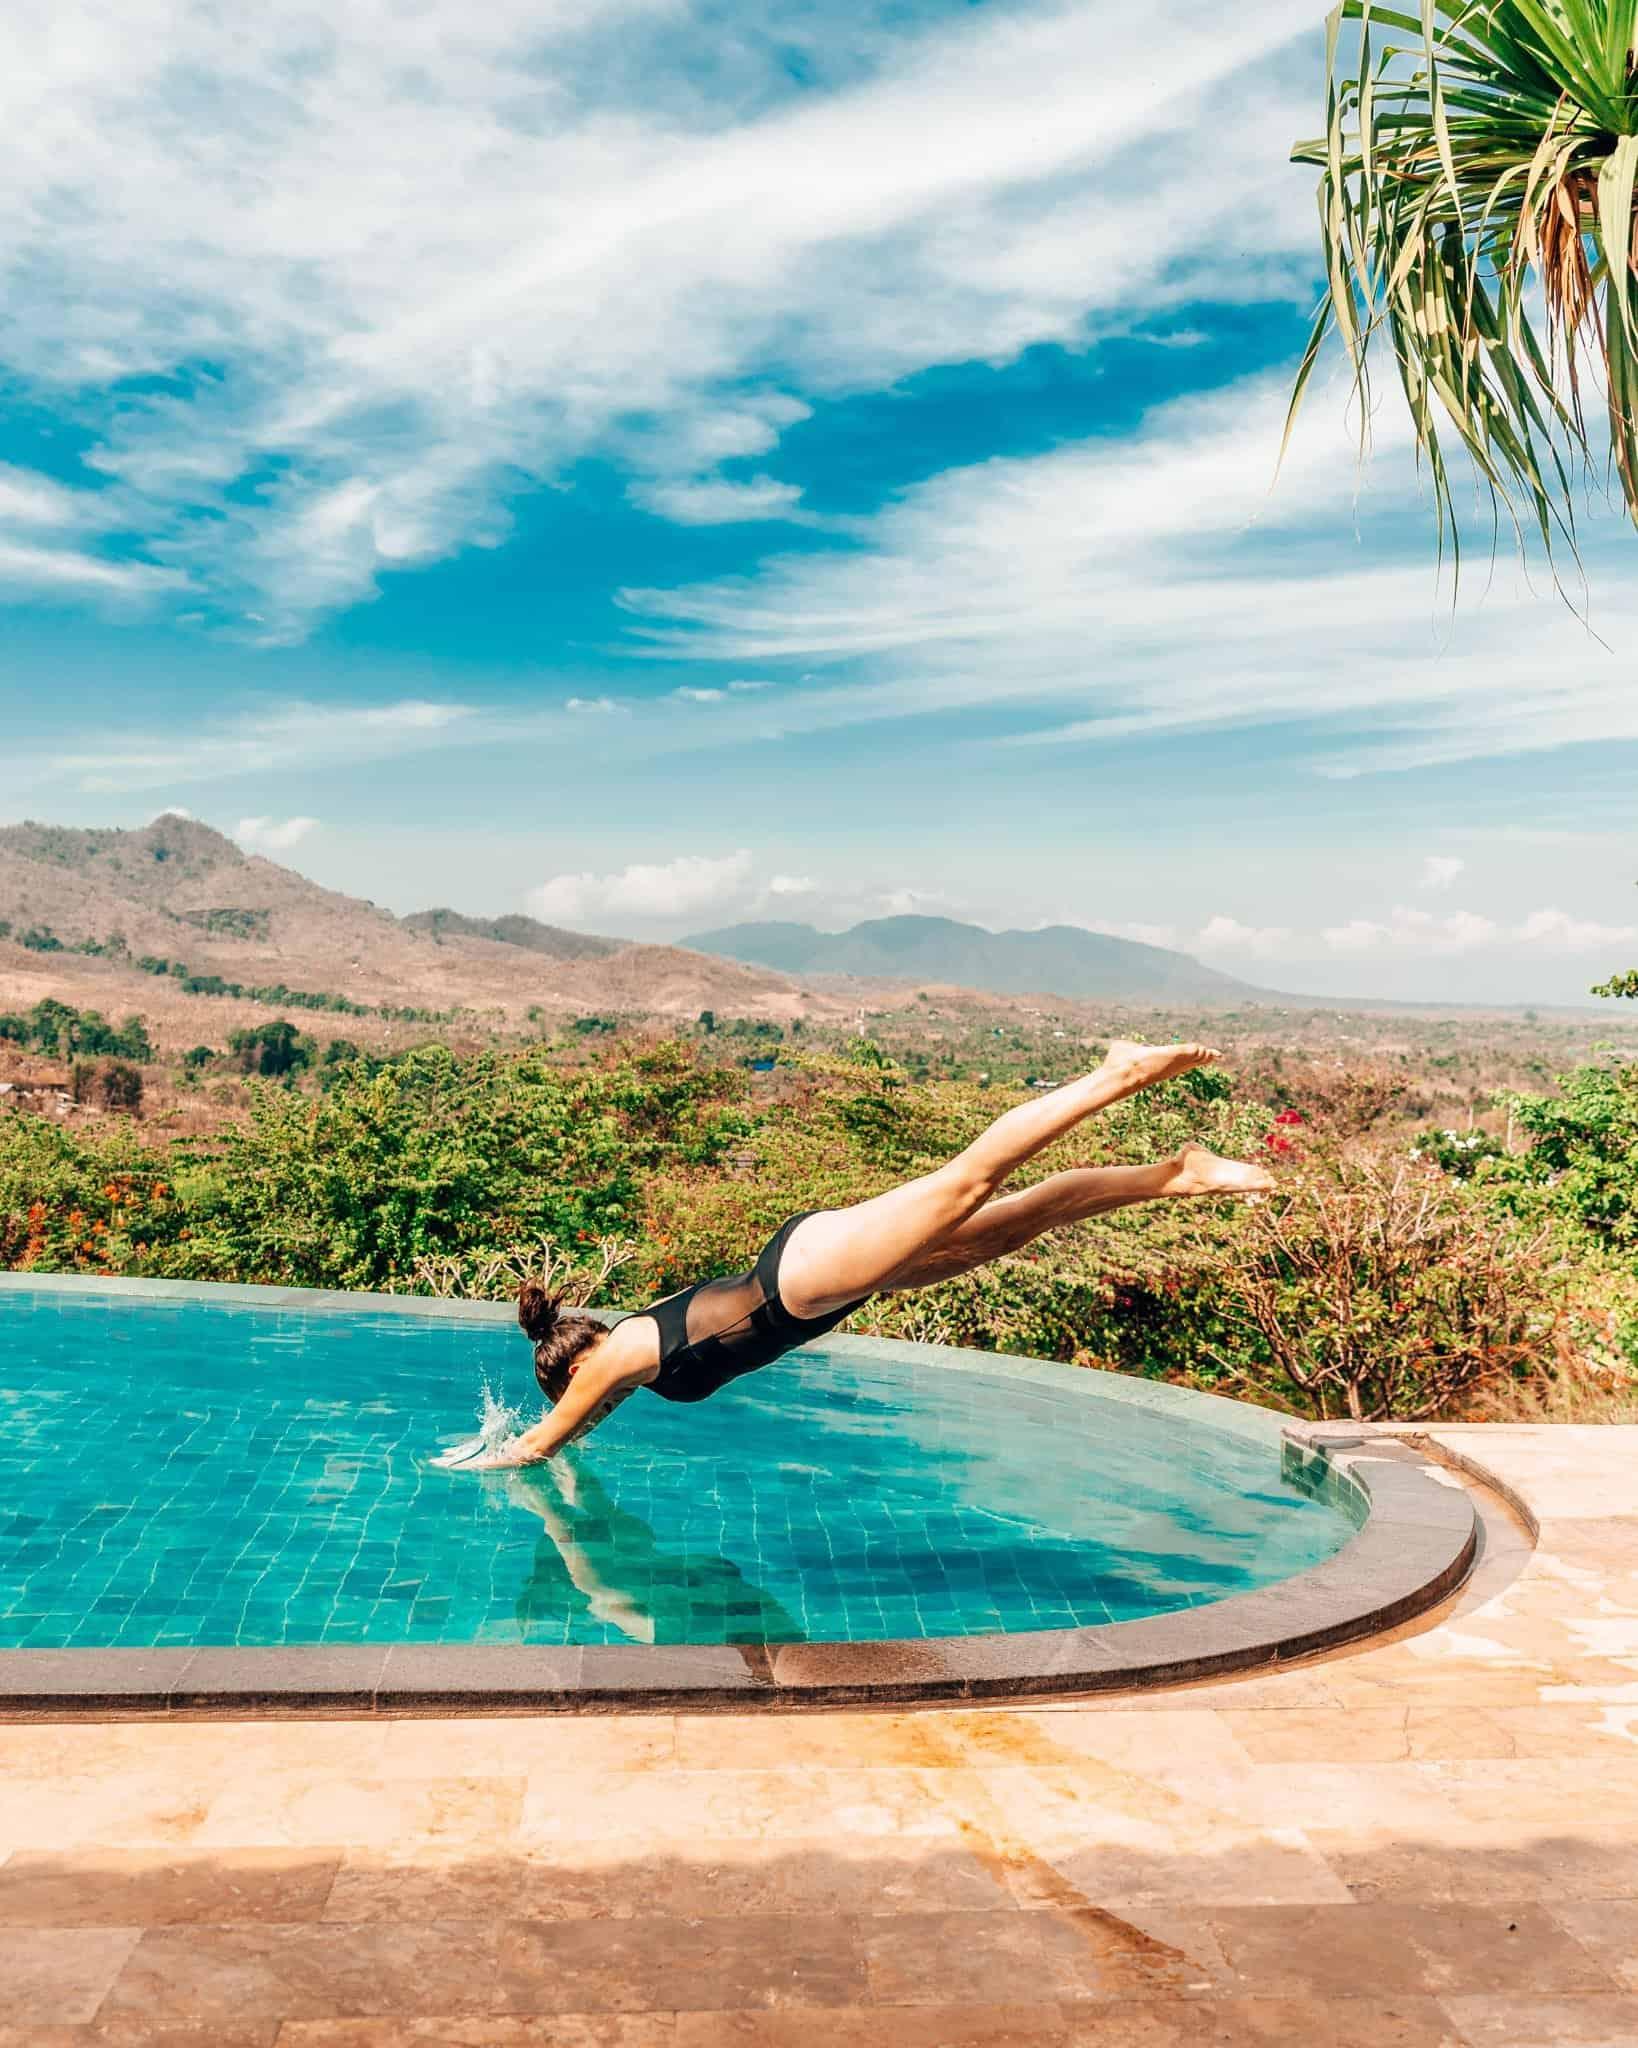 Jumping into the Pool at Sumberkima Hill, Bali - The Next Trip